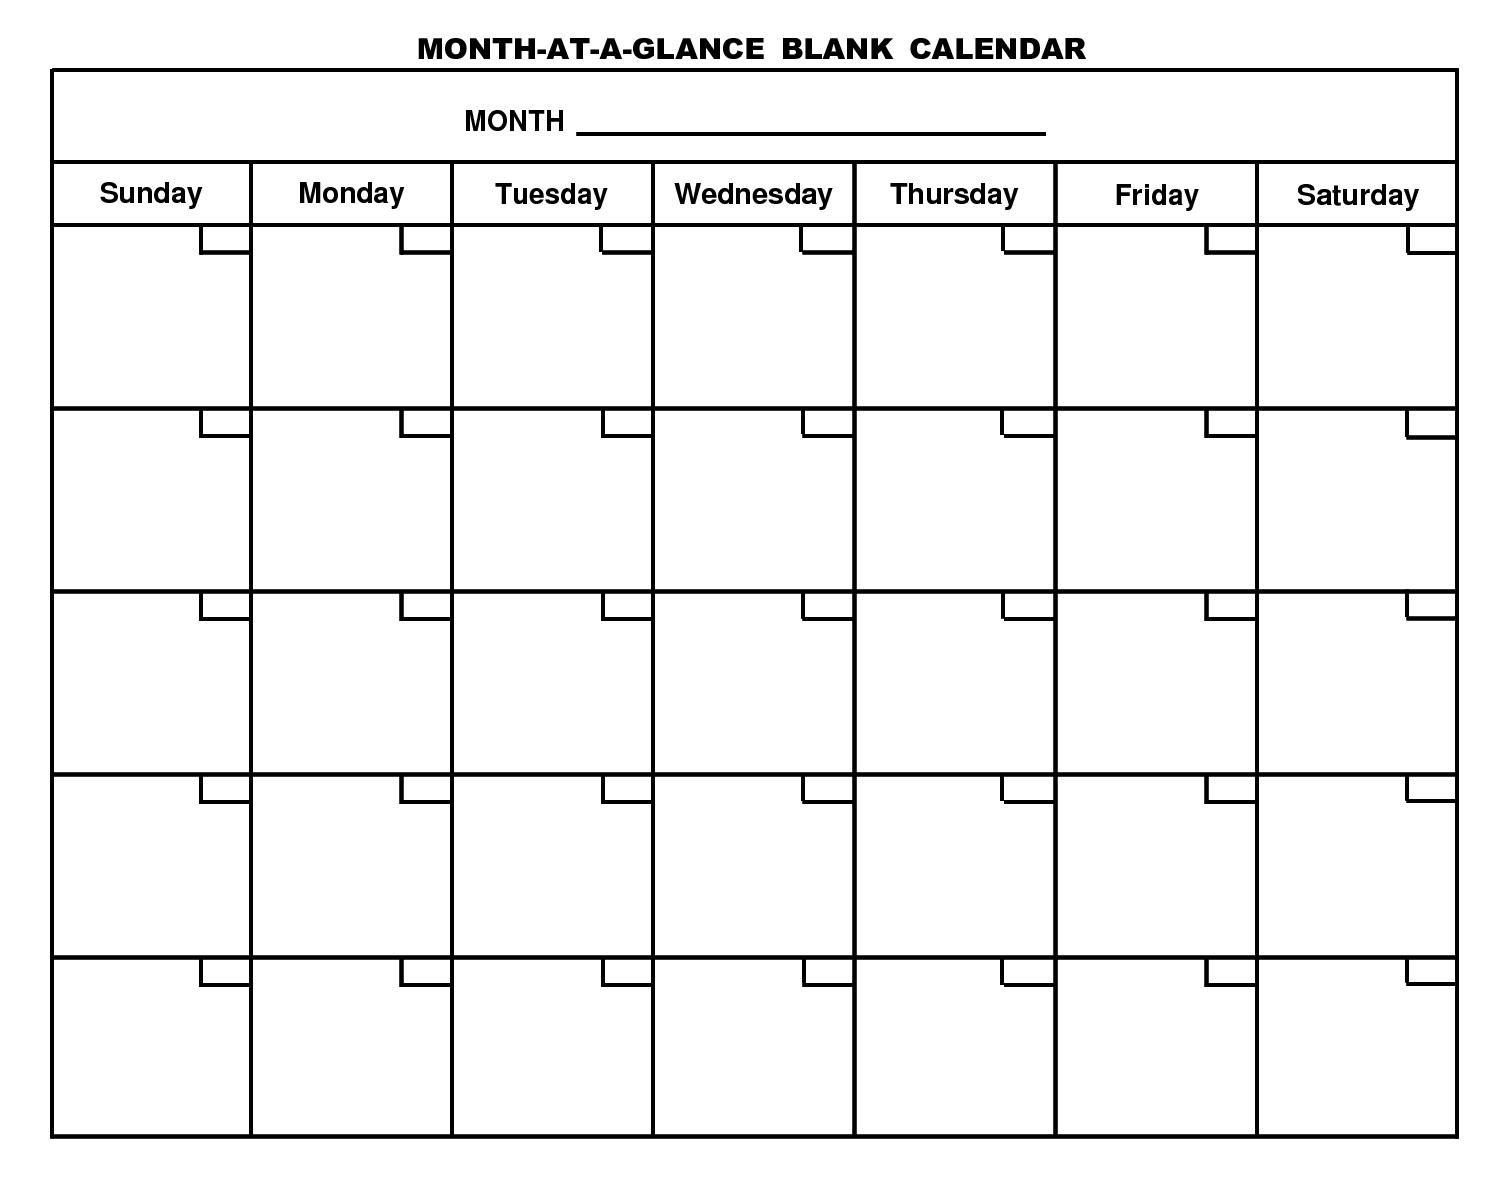 Printable Monthly Calendar Sunday To Saturday No Dates | Example Calendar Printable